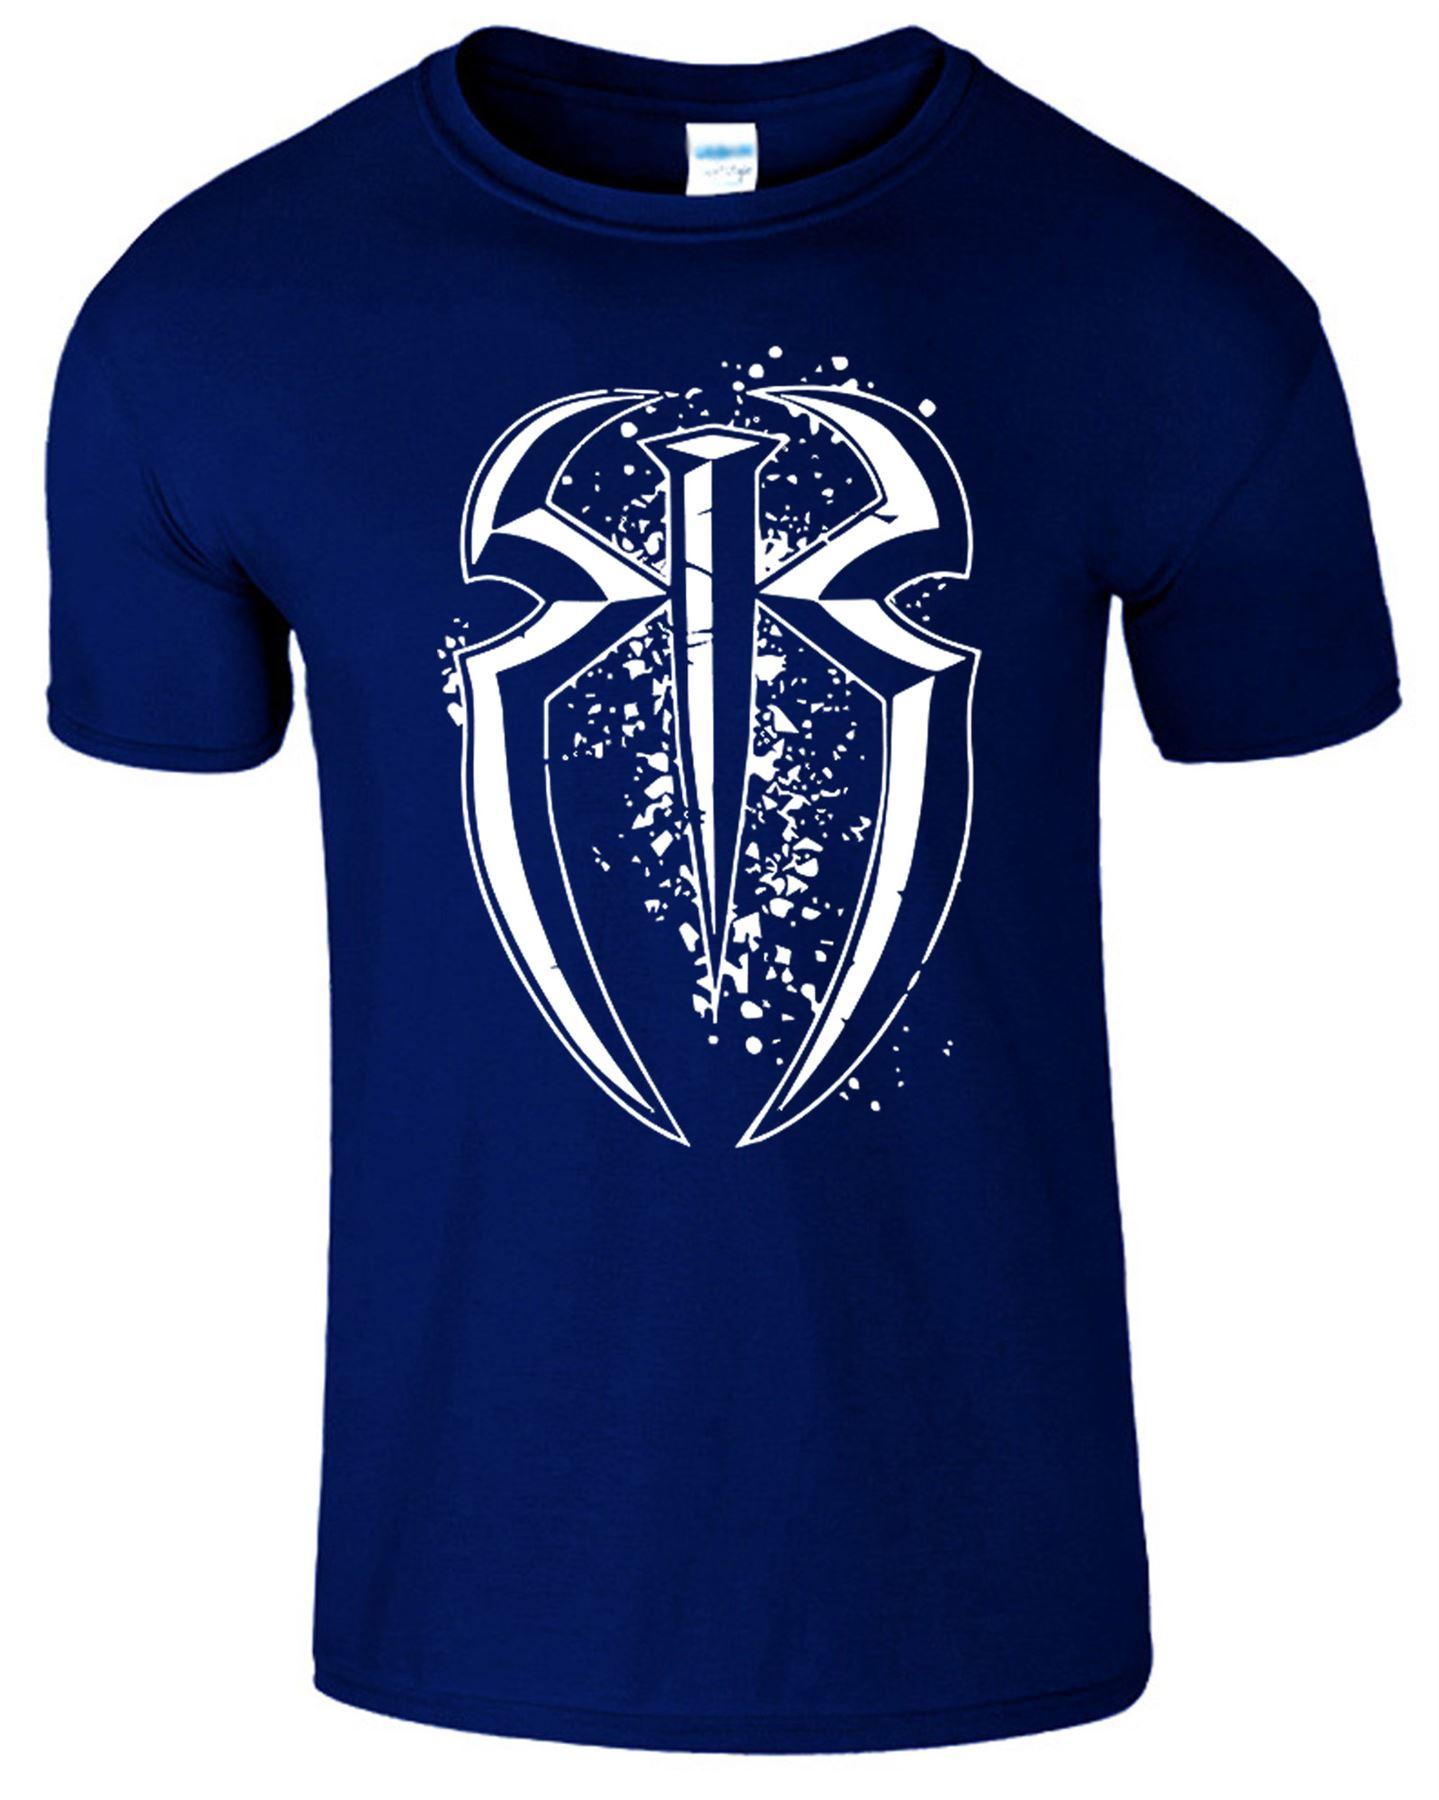 roman reigns wwe wrestling spear logo kids gift t shirt. Black Bedroom Furniture Sets. Home Design Ideas